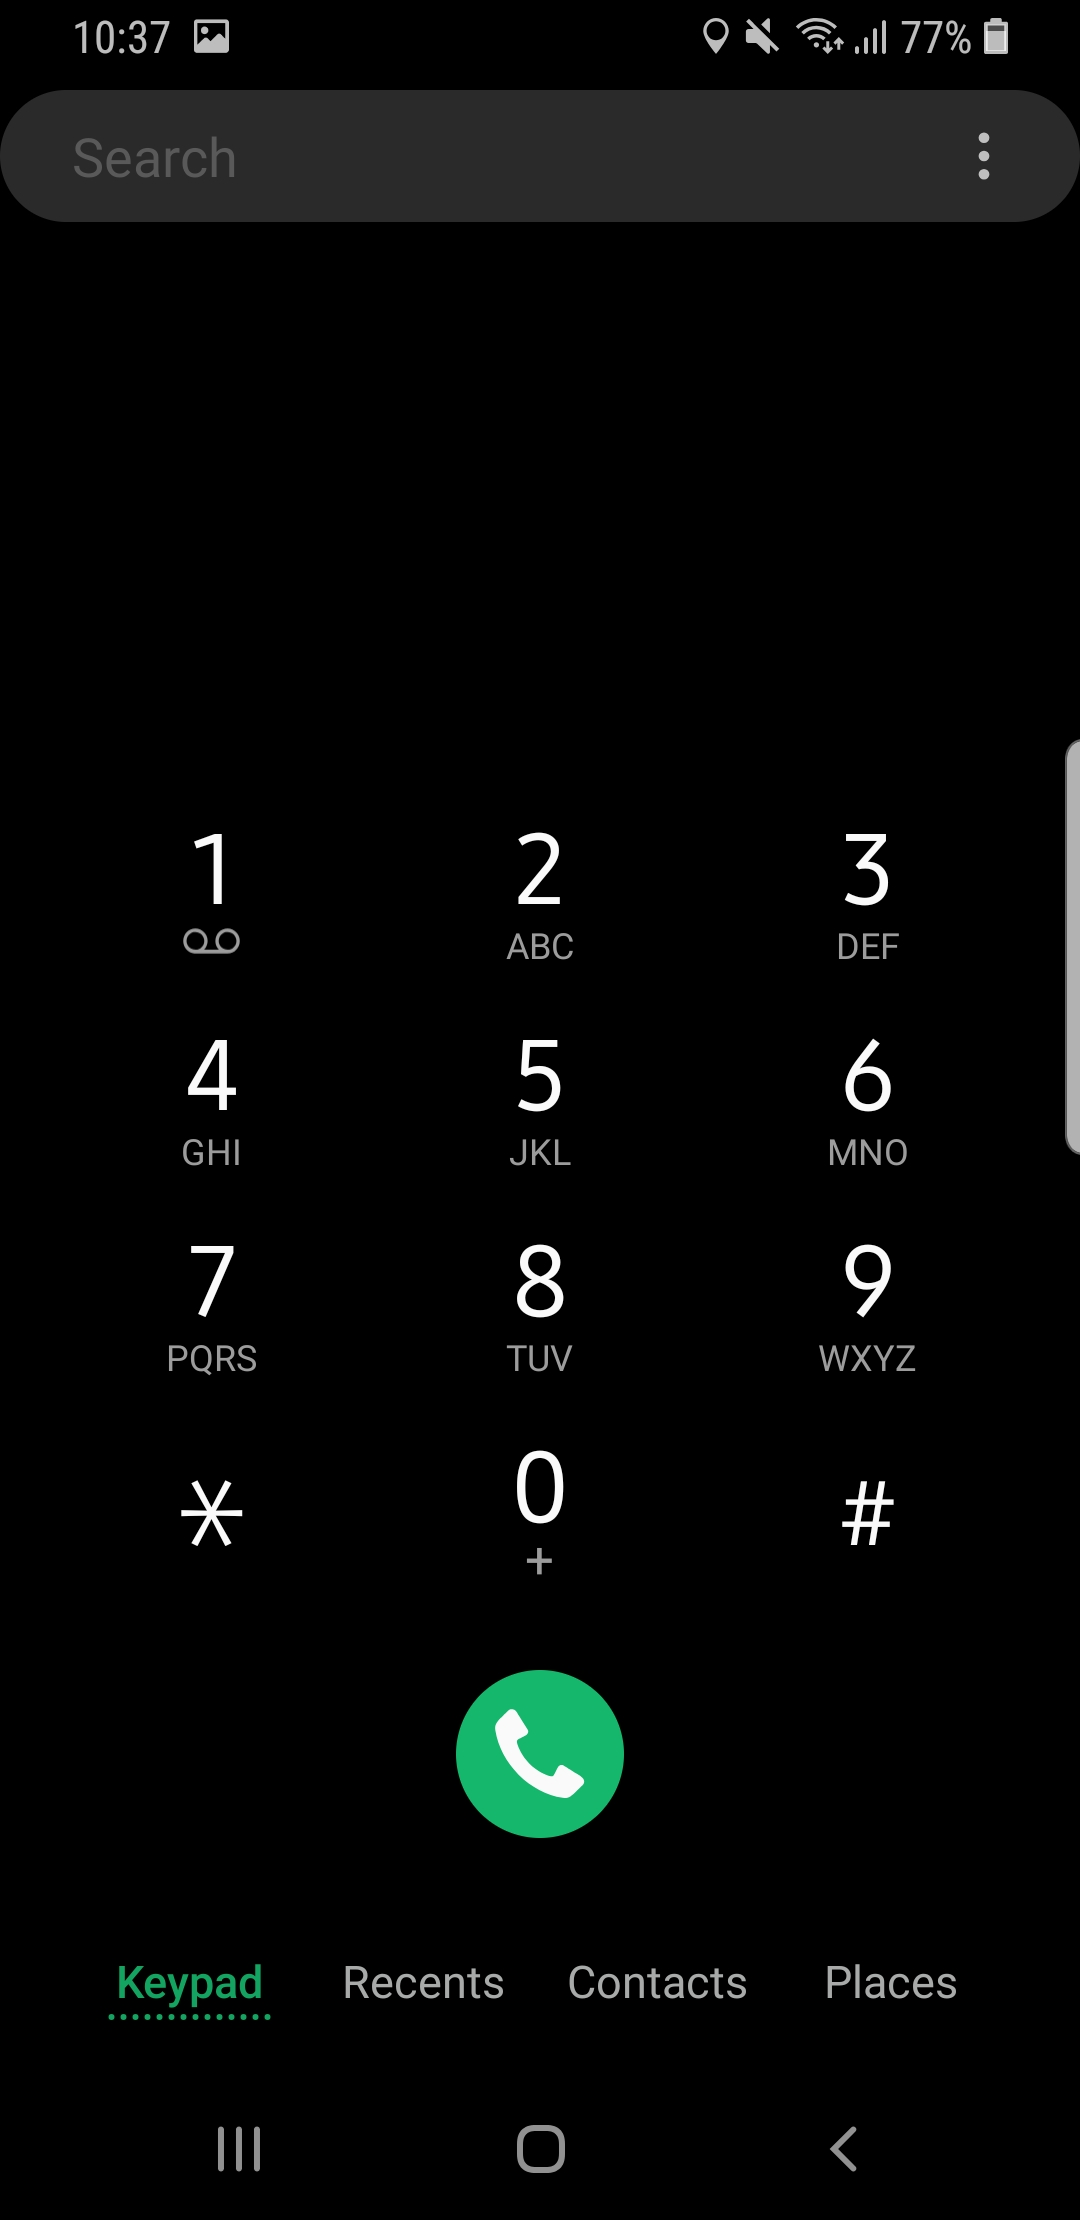 descargar firmware android 9 samsung s9 plus